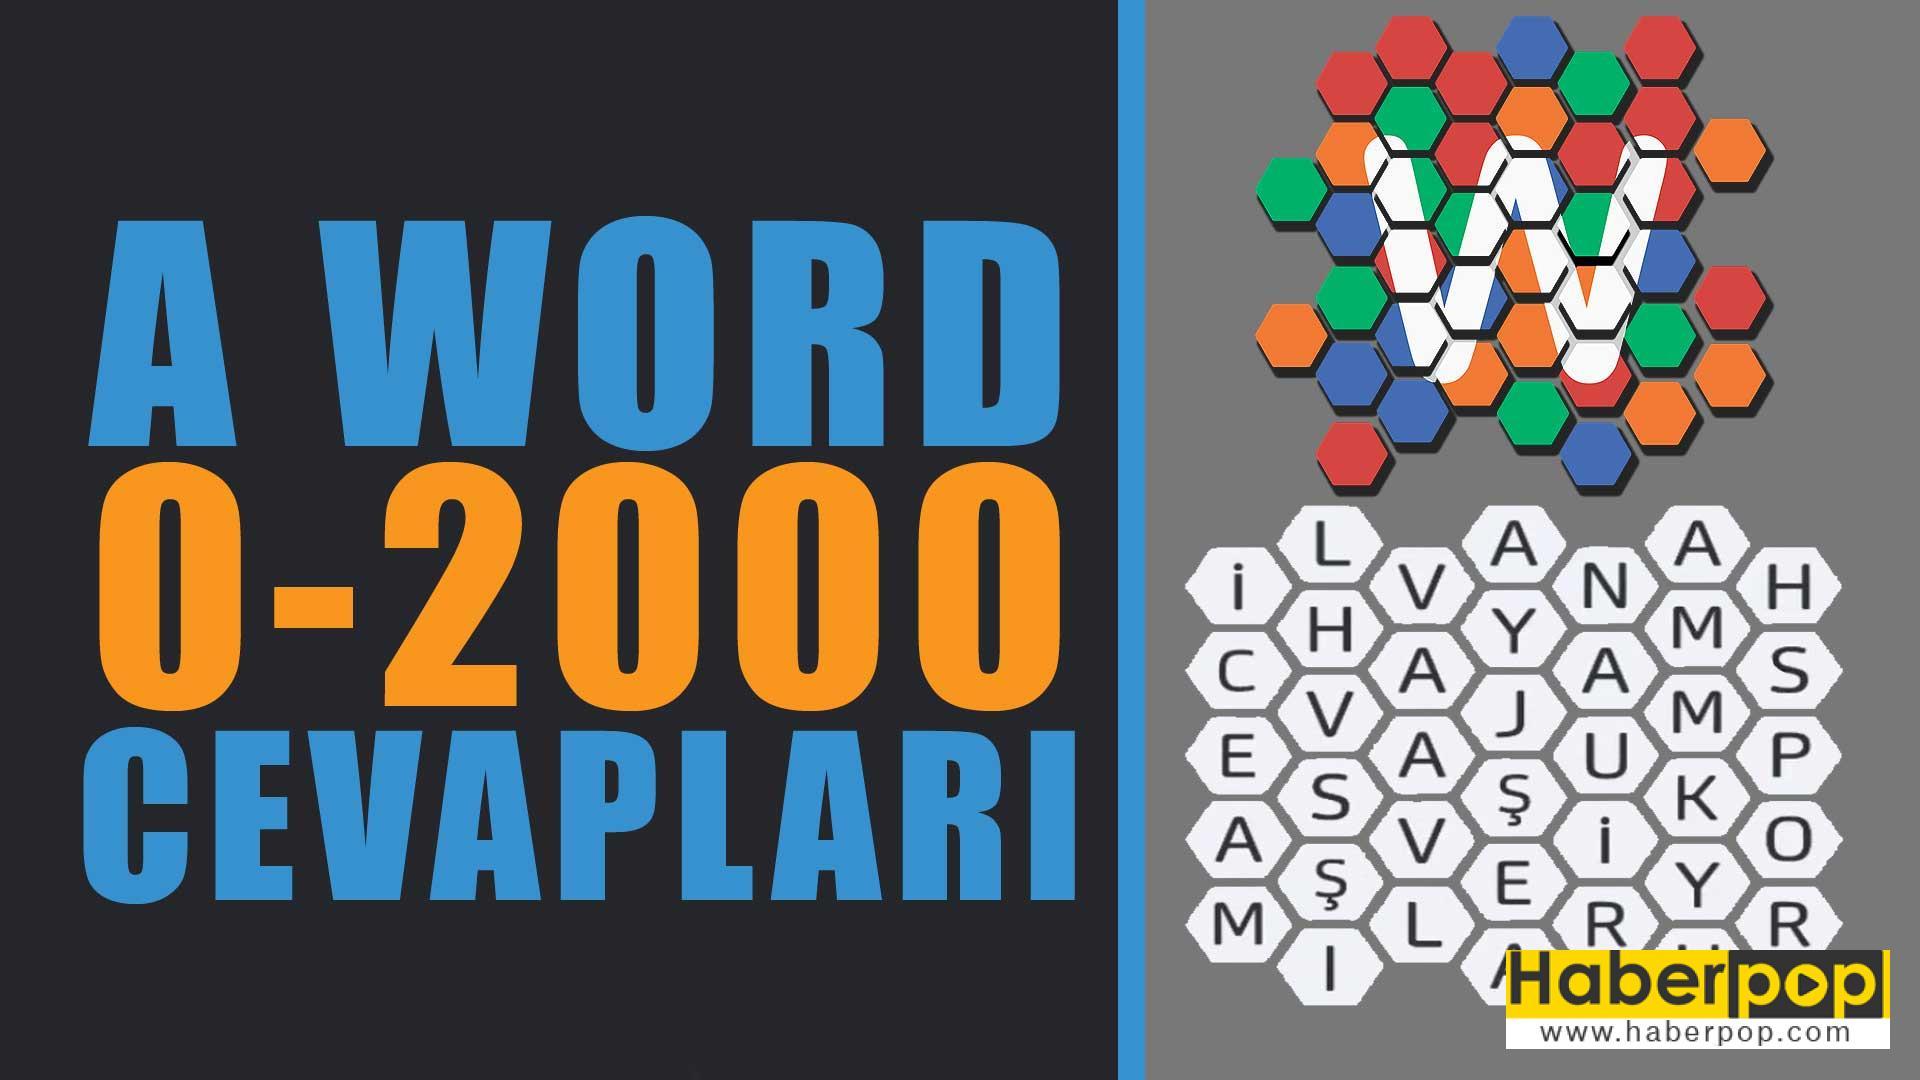 a word oyunu cevaplari-a word bulmaca tum cevaplari-a word kelime oyunu cevaplari www.haberpop.com